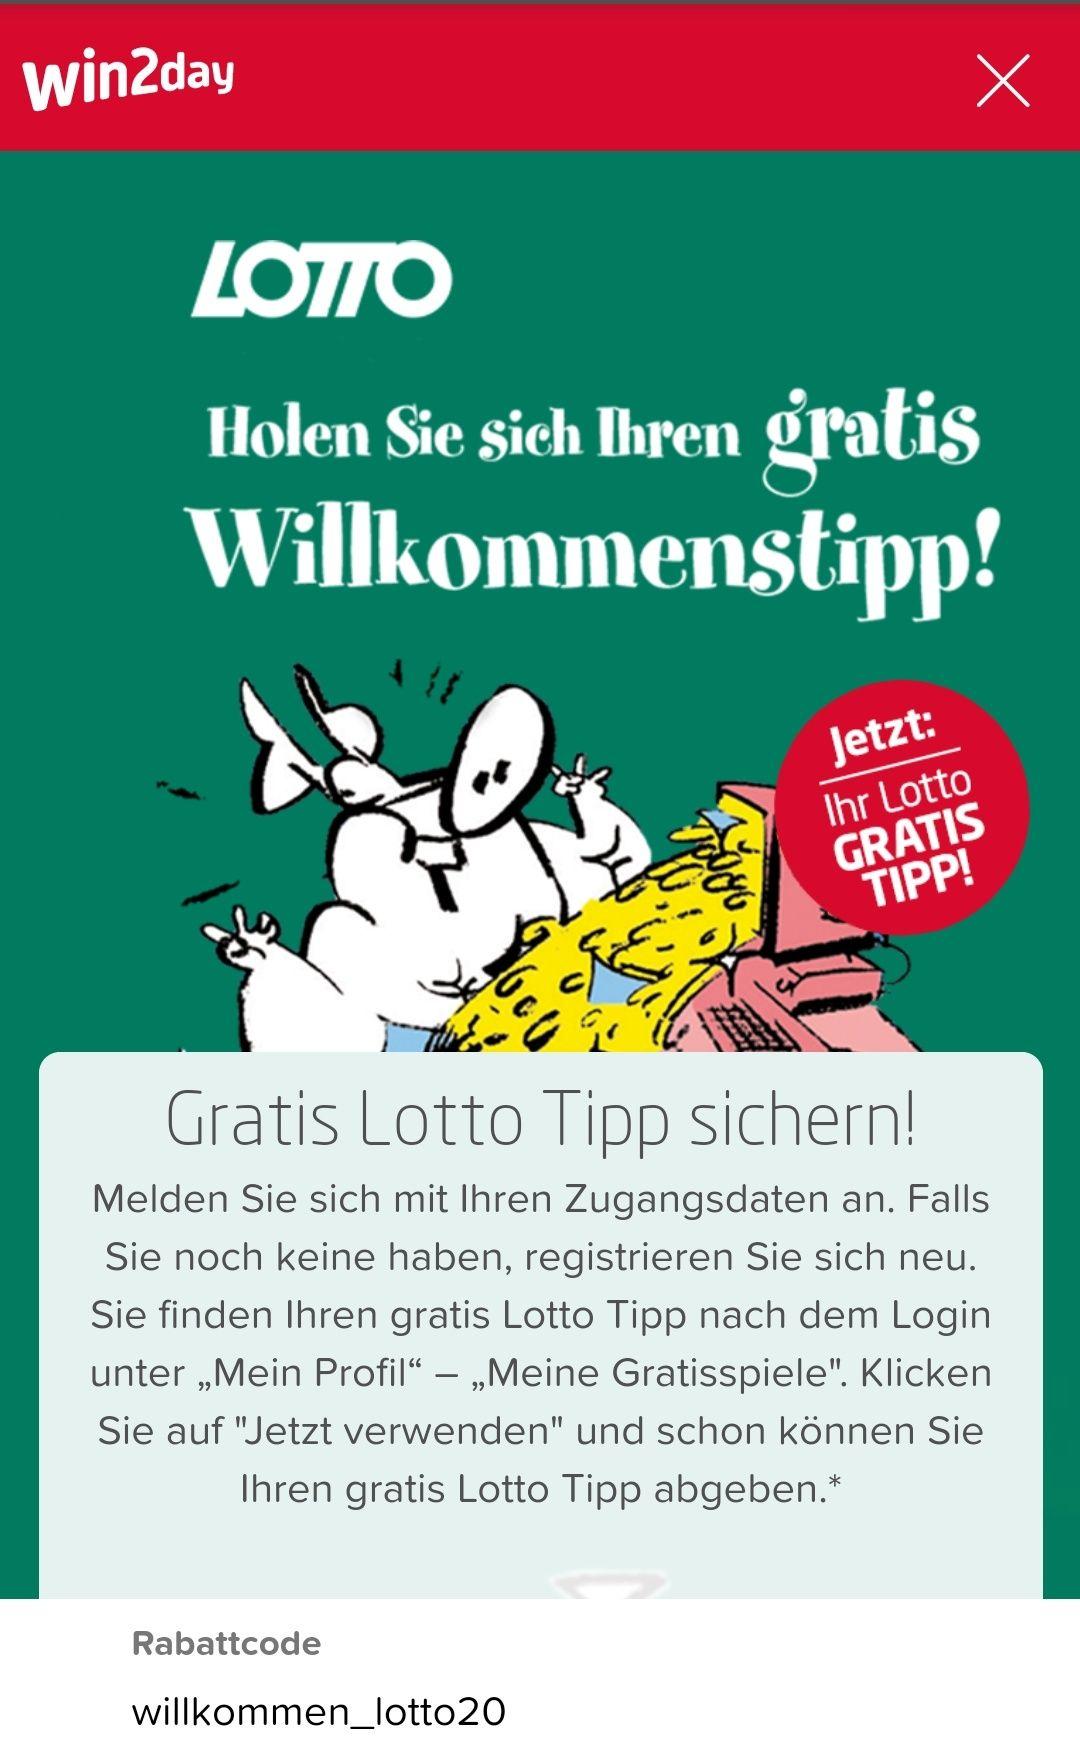 win2day.at -1,20€ bzw. GRATIS LOTTO TIPP